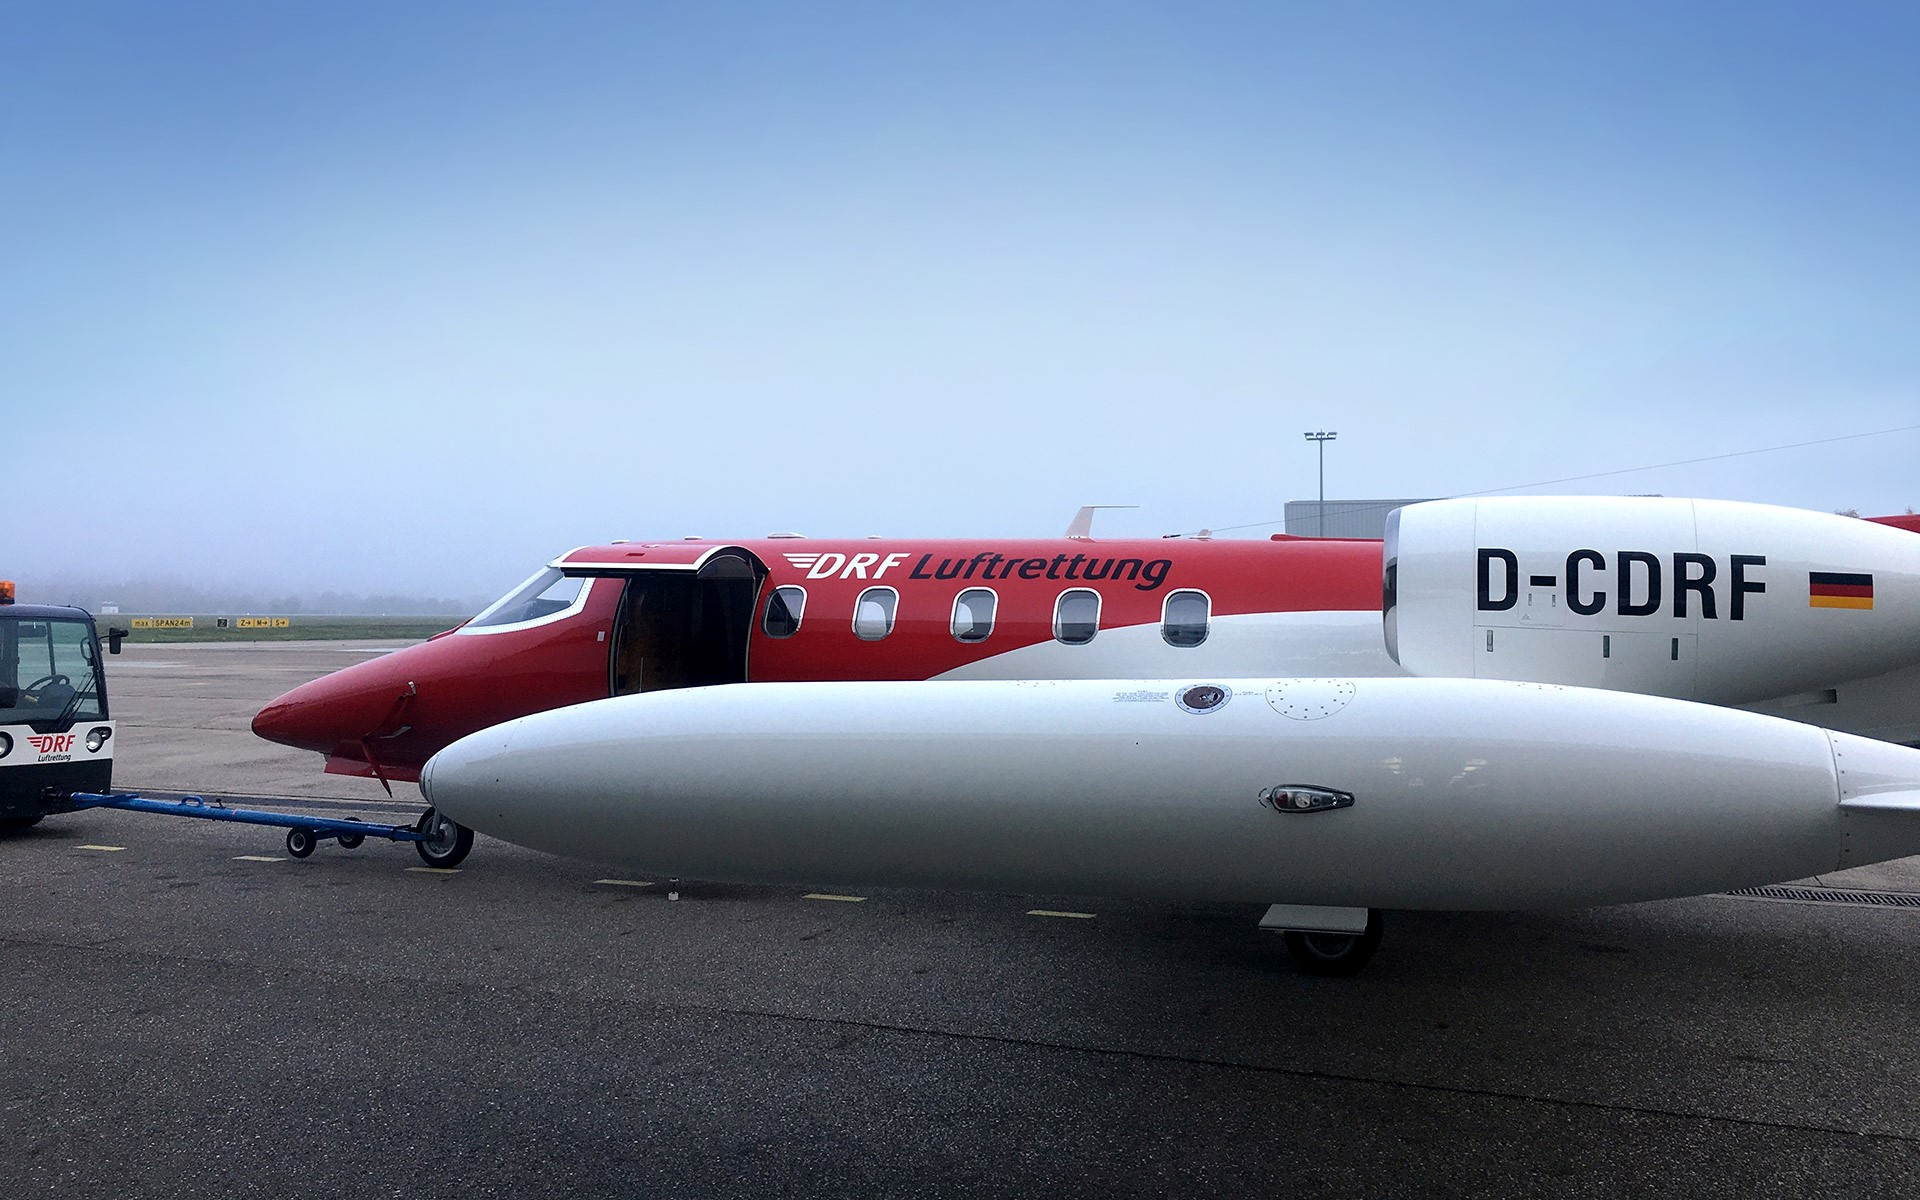 Hier wird der Learjet am Flughafen Karlsruhe/Baden-Baden bereitgestellt... Foto: E. Bittner